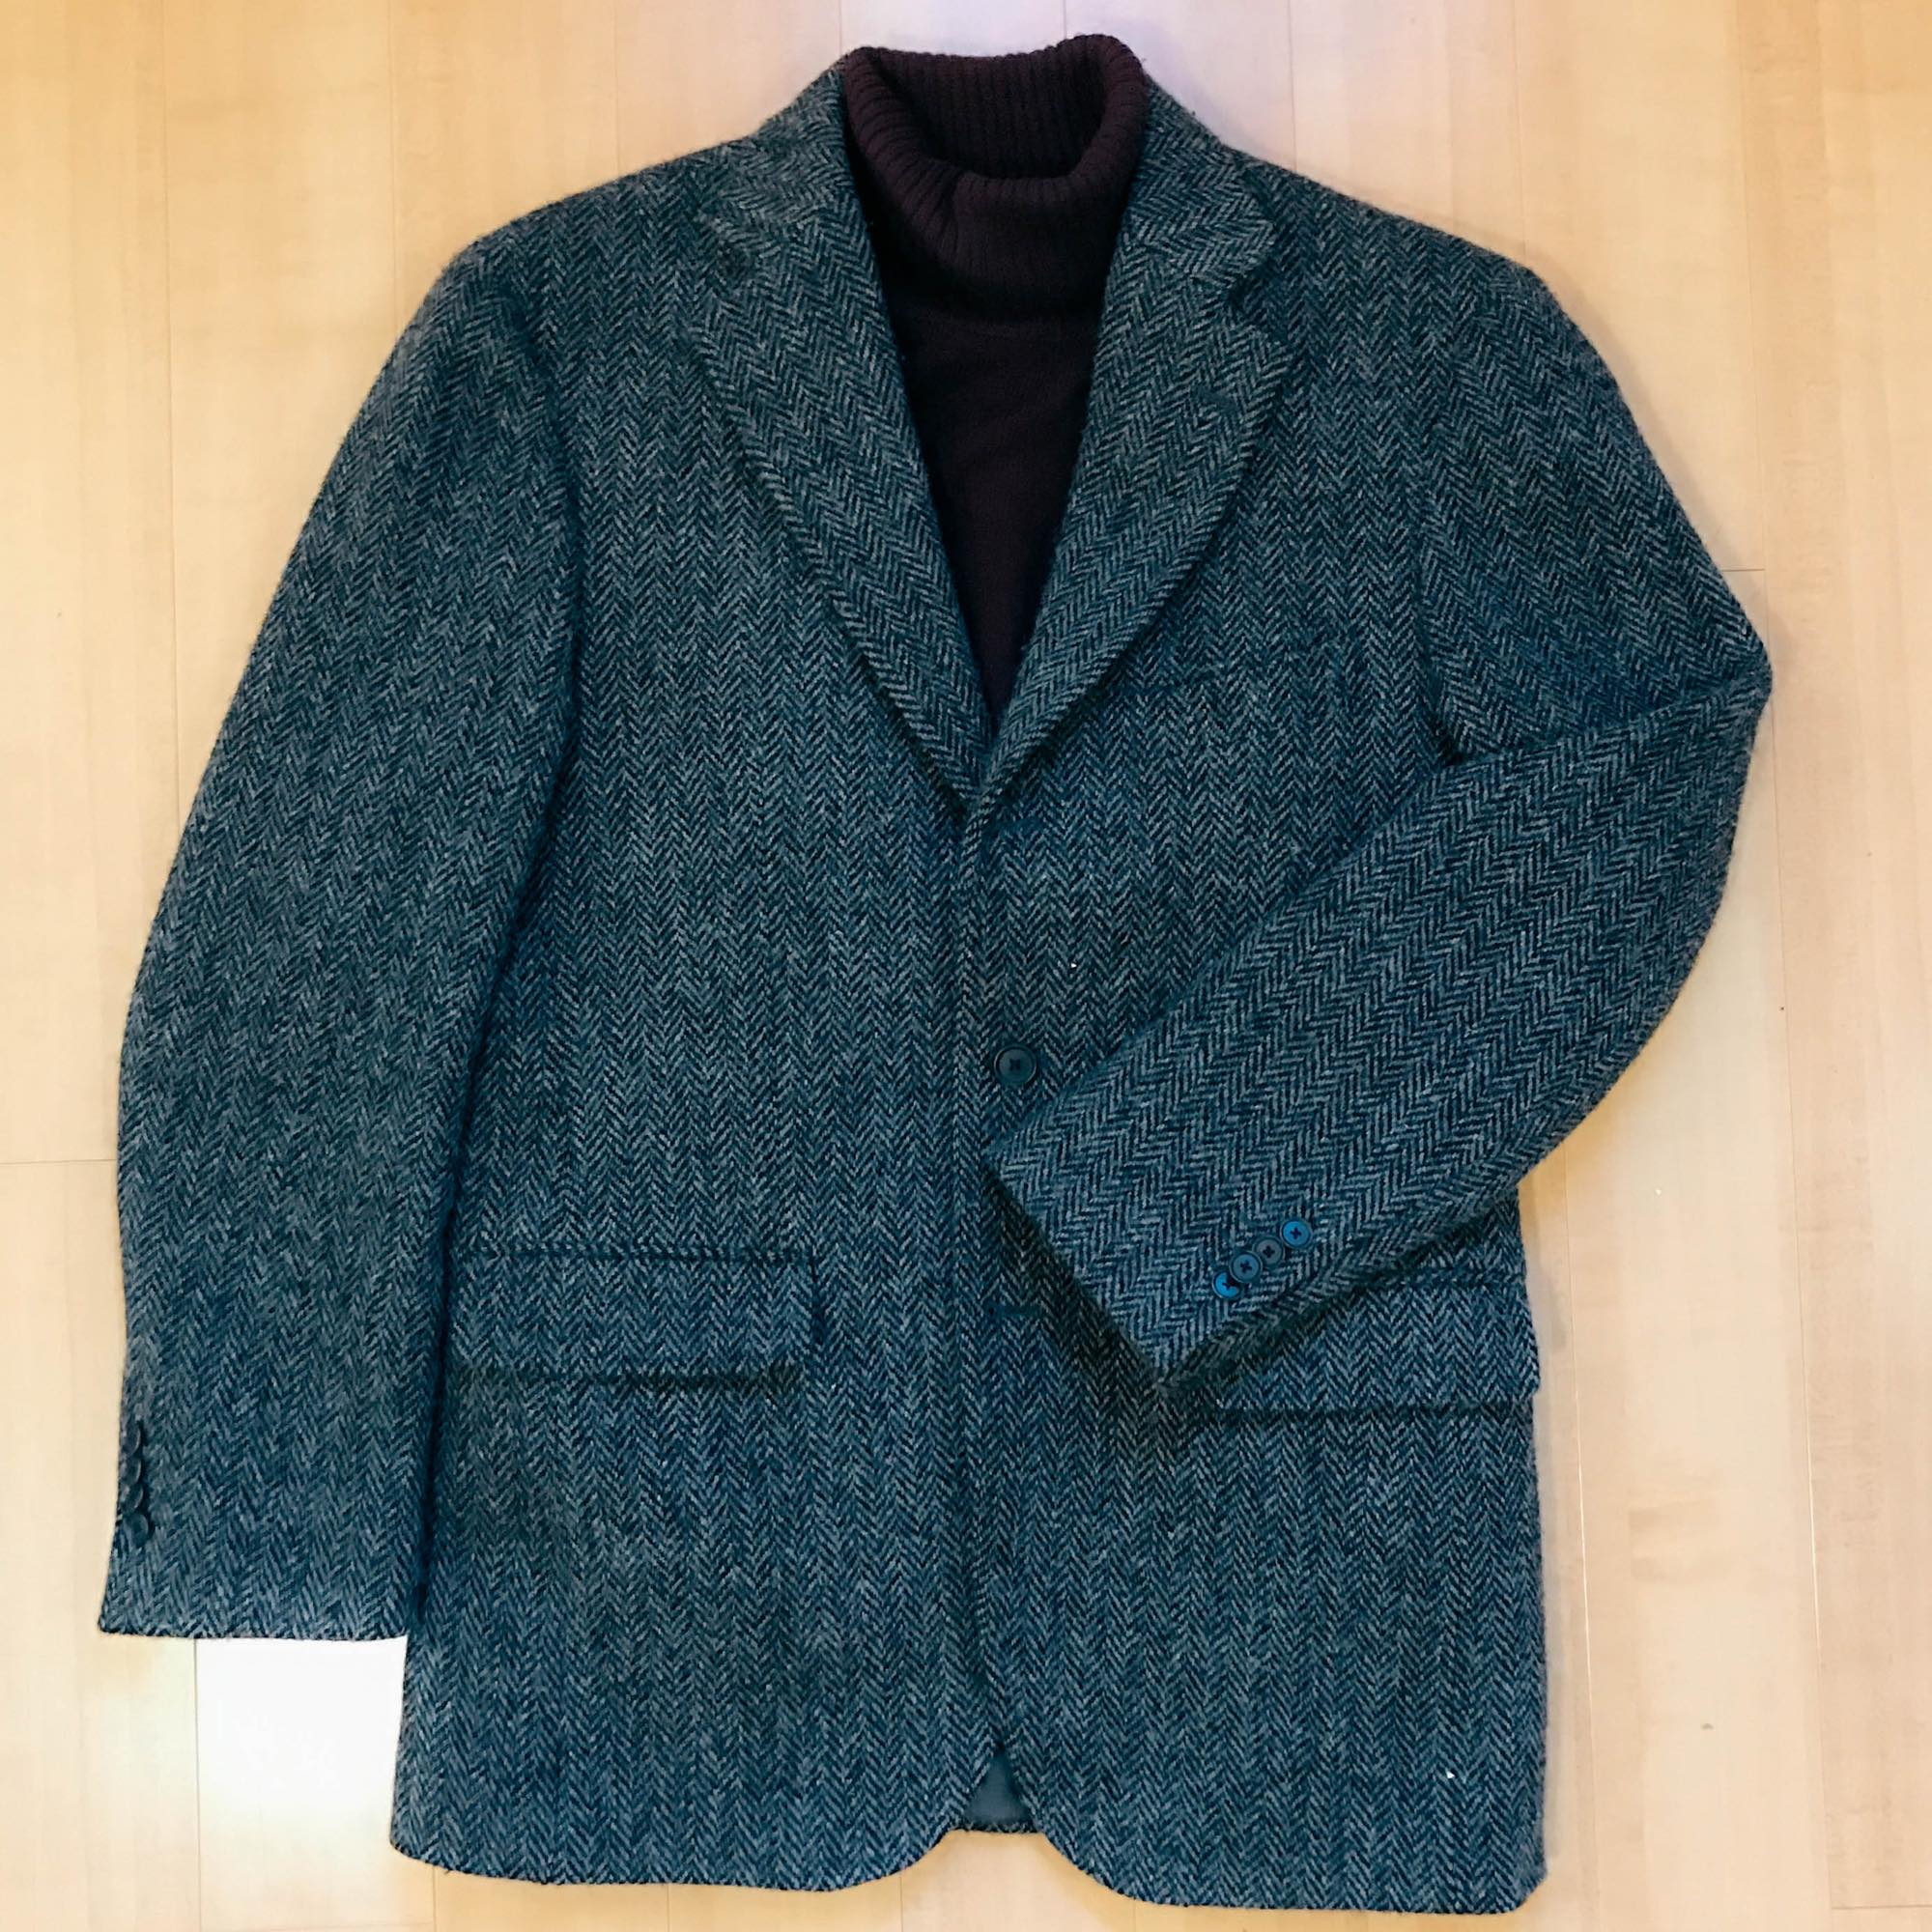 teijin-jacket